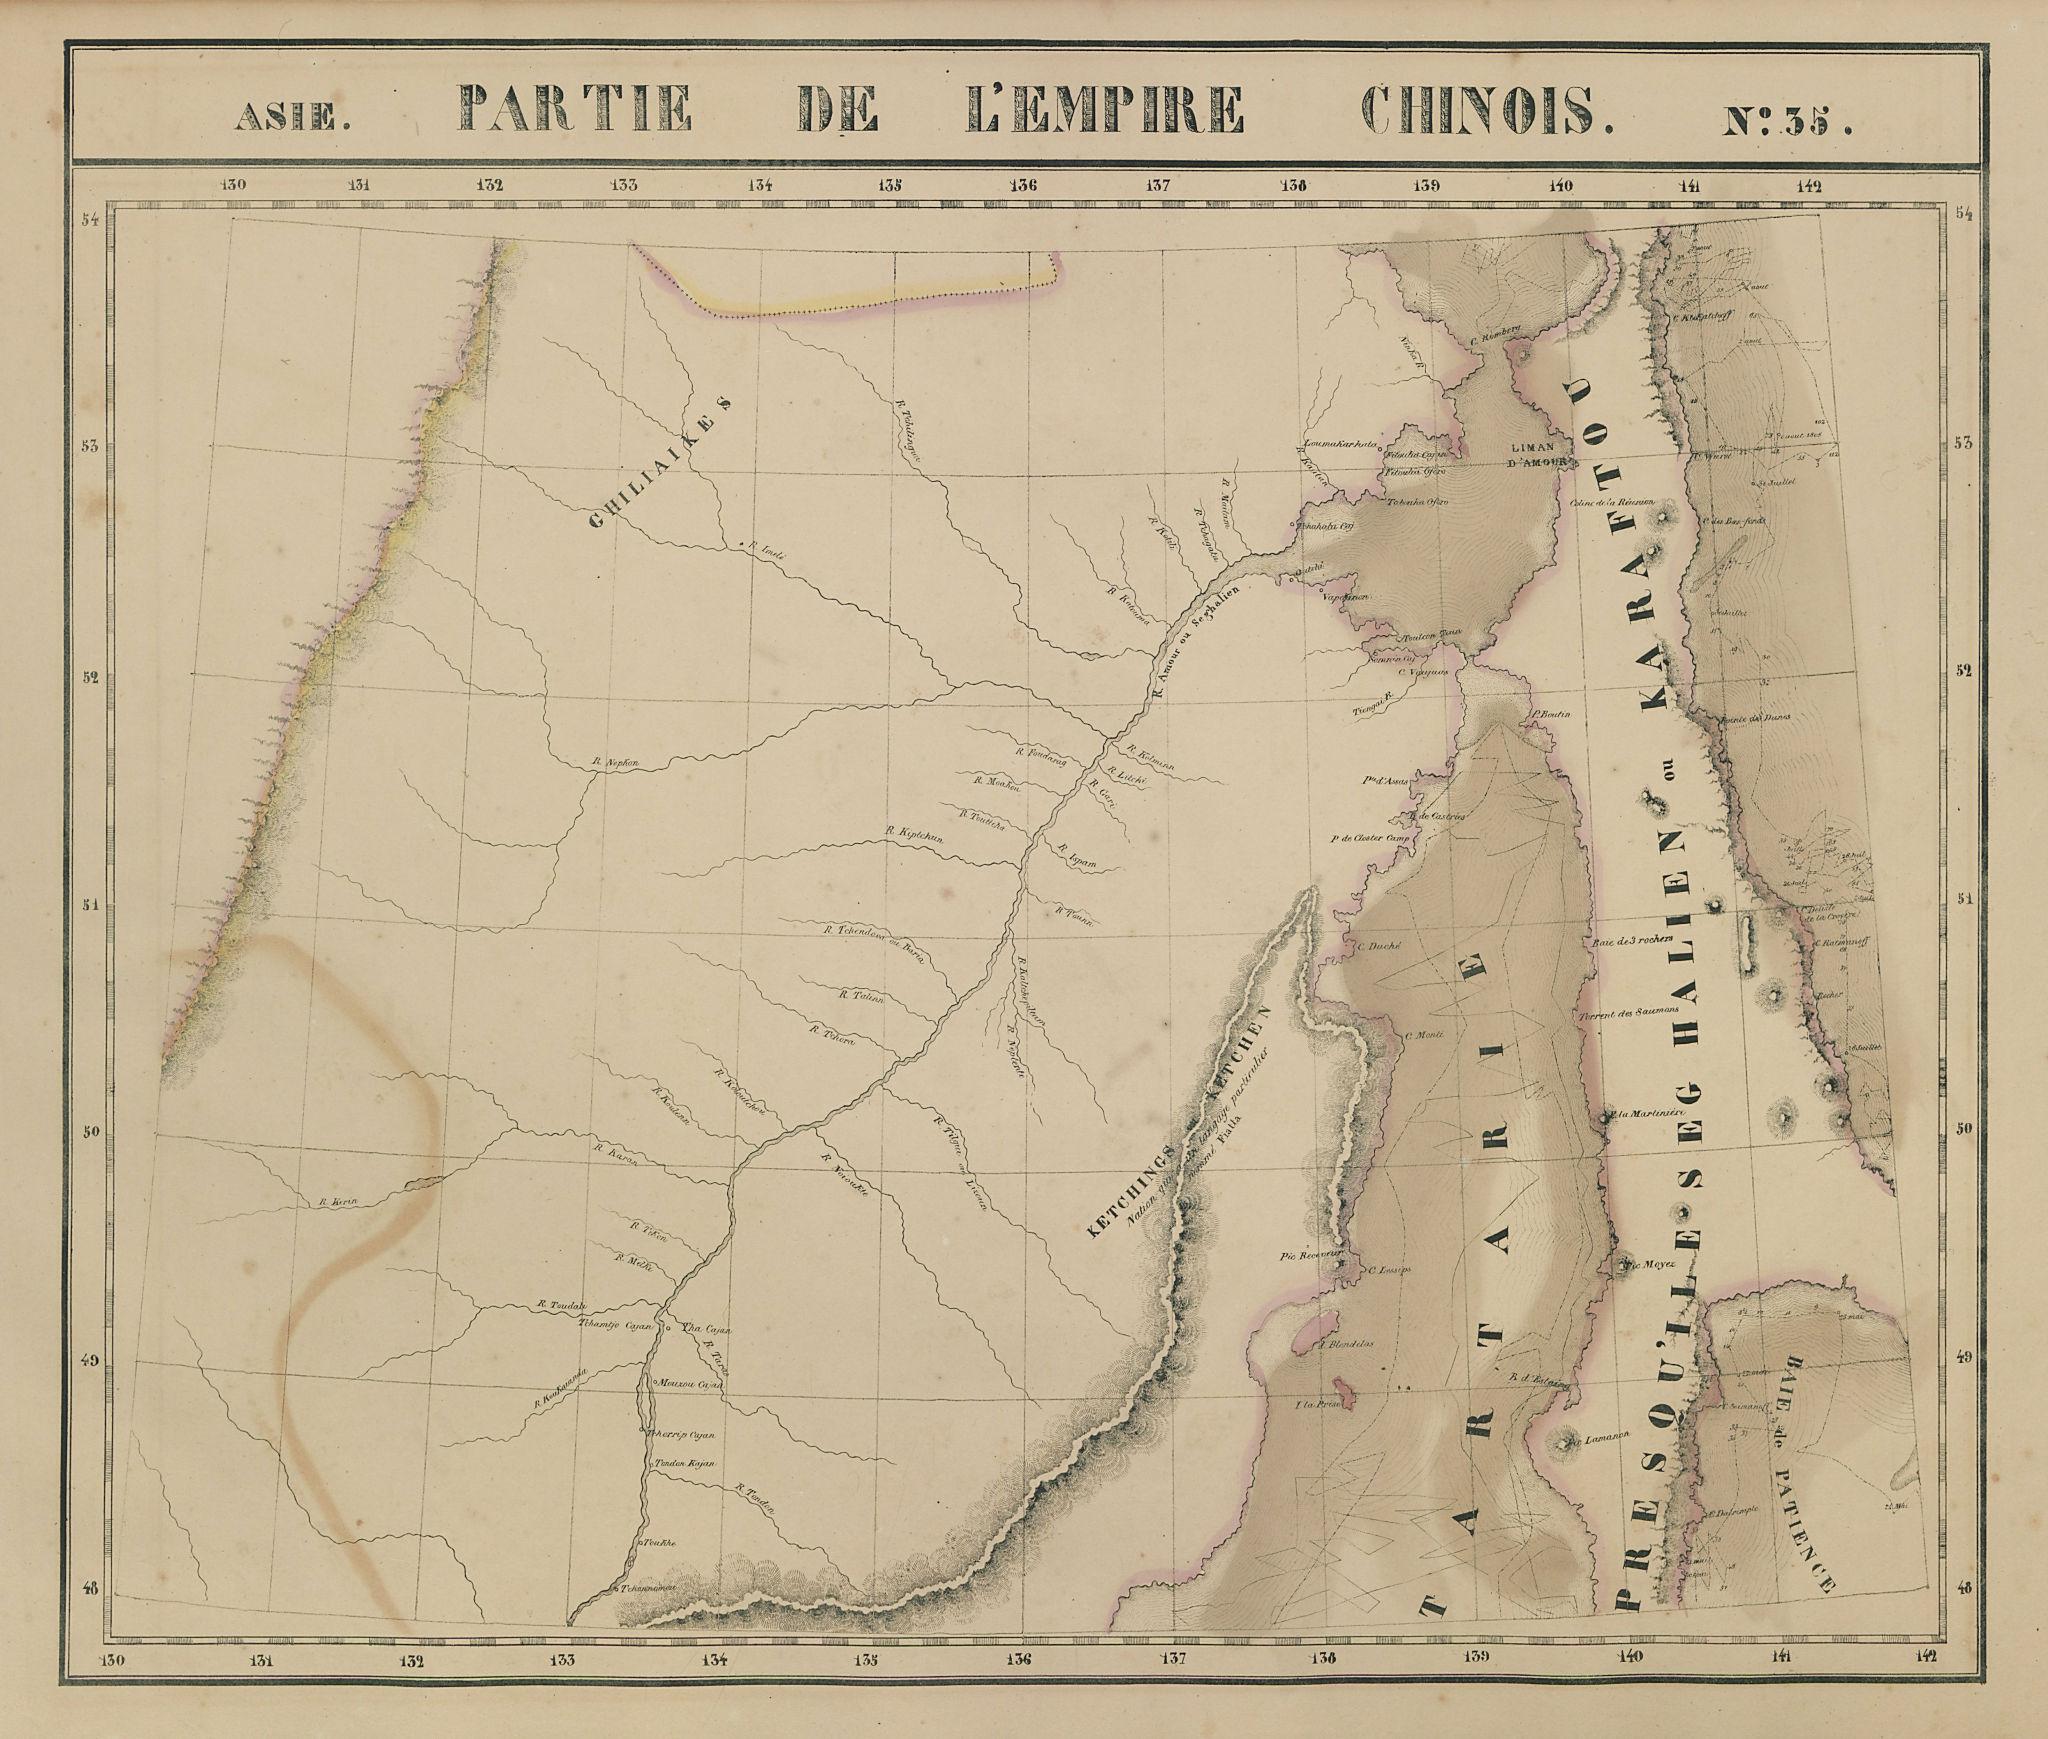 Asie. Empire Chinois #35 Russian Far East. Amur Sakhalin. VANDERMAELEN 1827 map